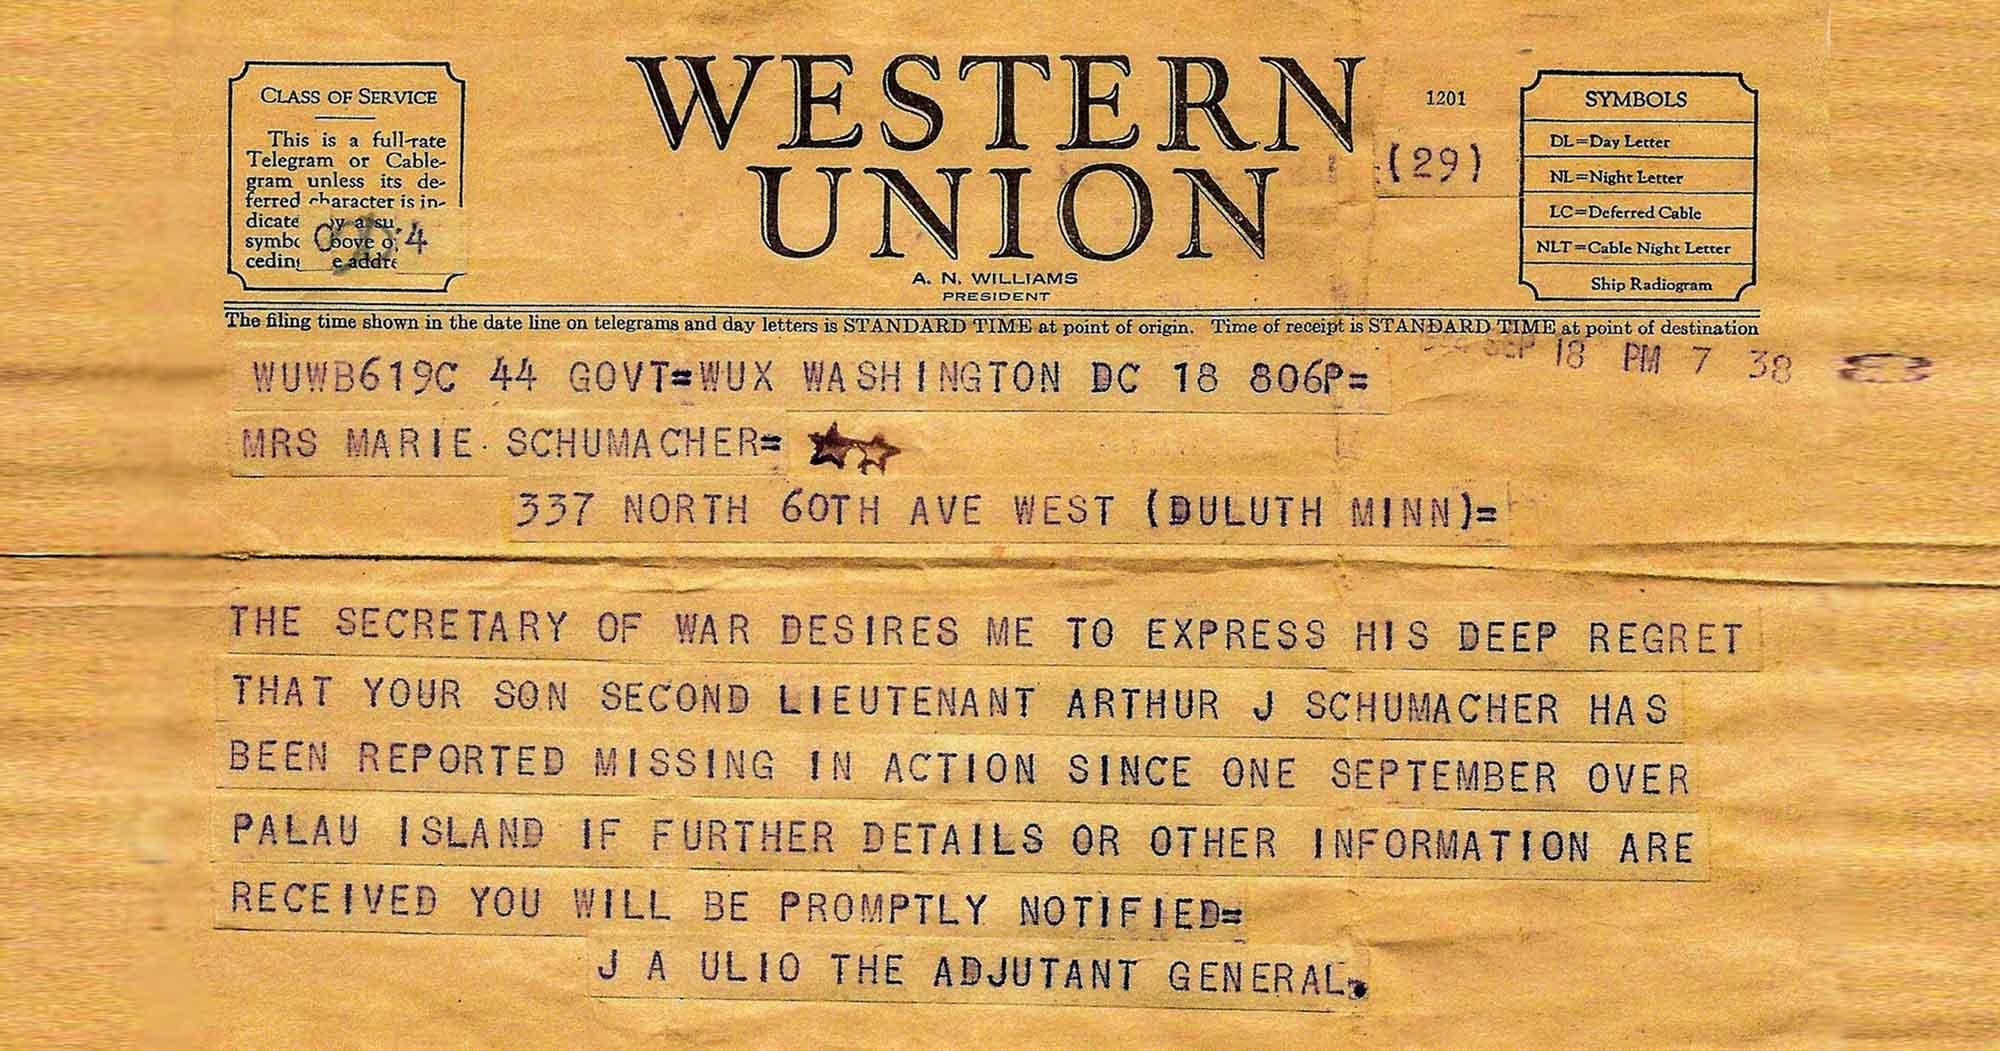 MIA Telegram from WWII